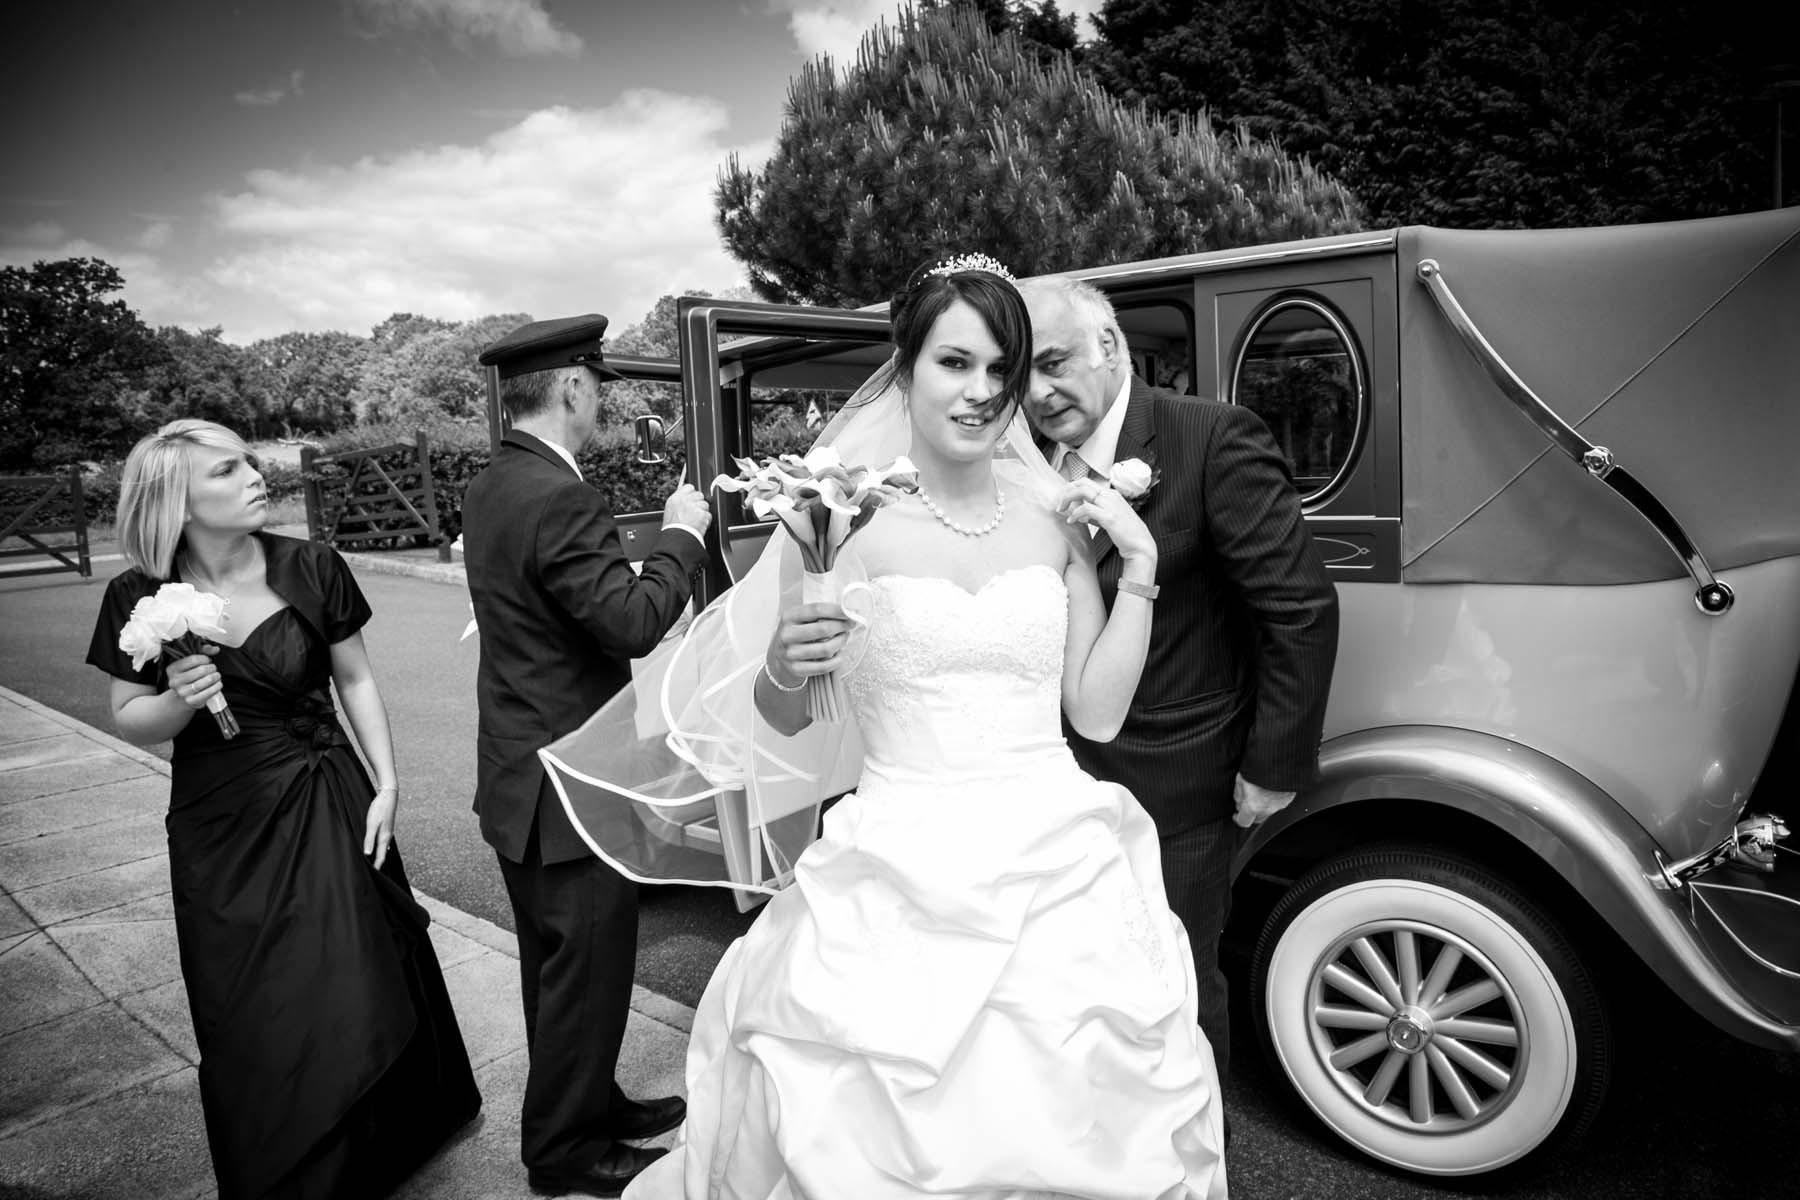 Sussex & Surrey Wedding Photographer - Ceremony (5)